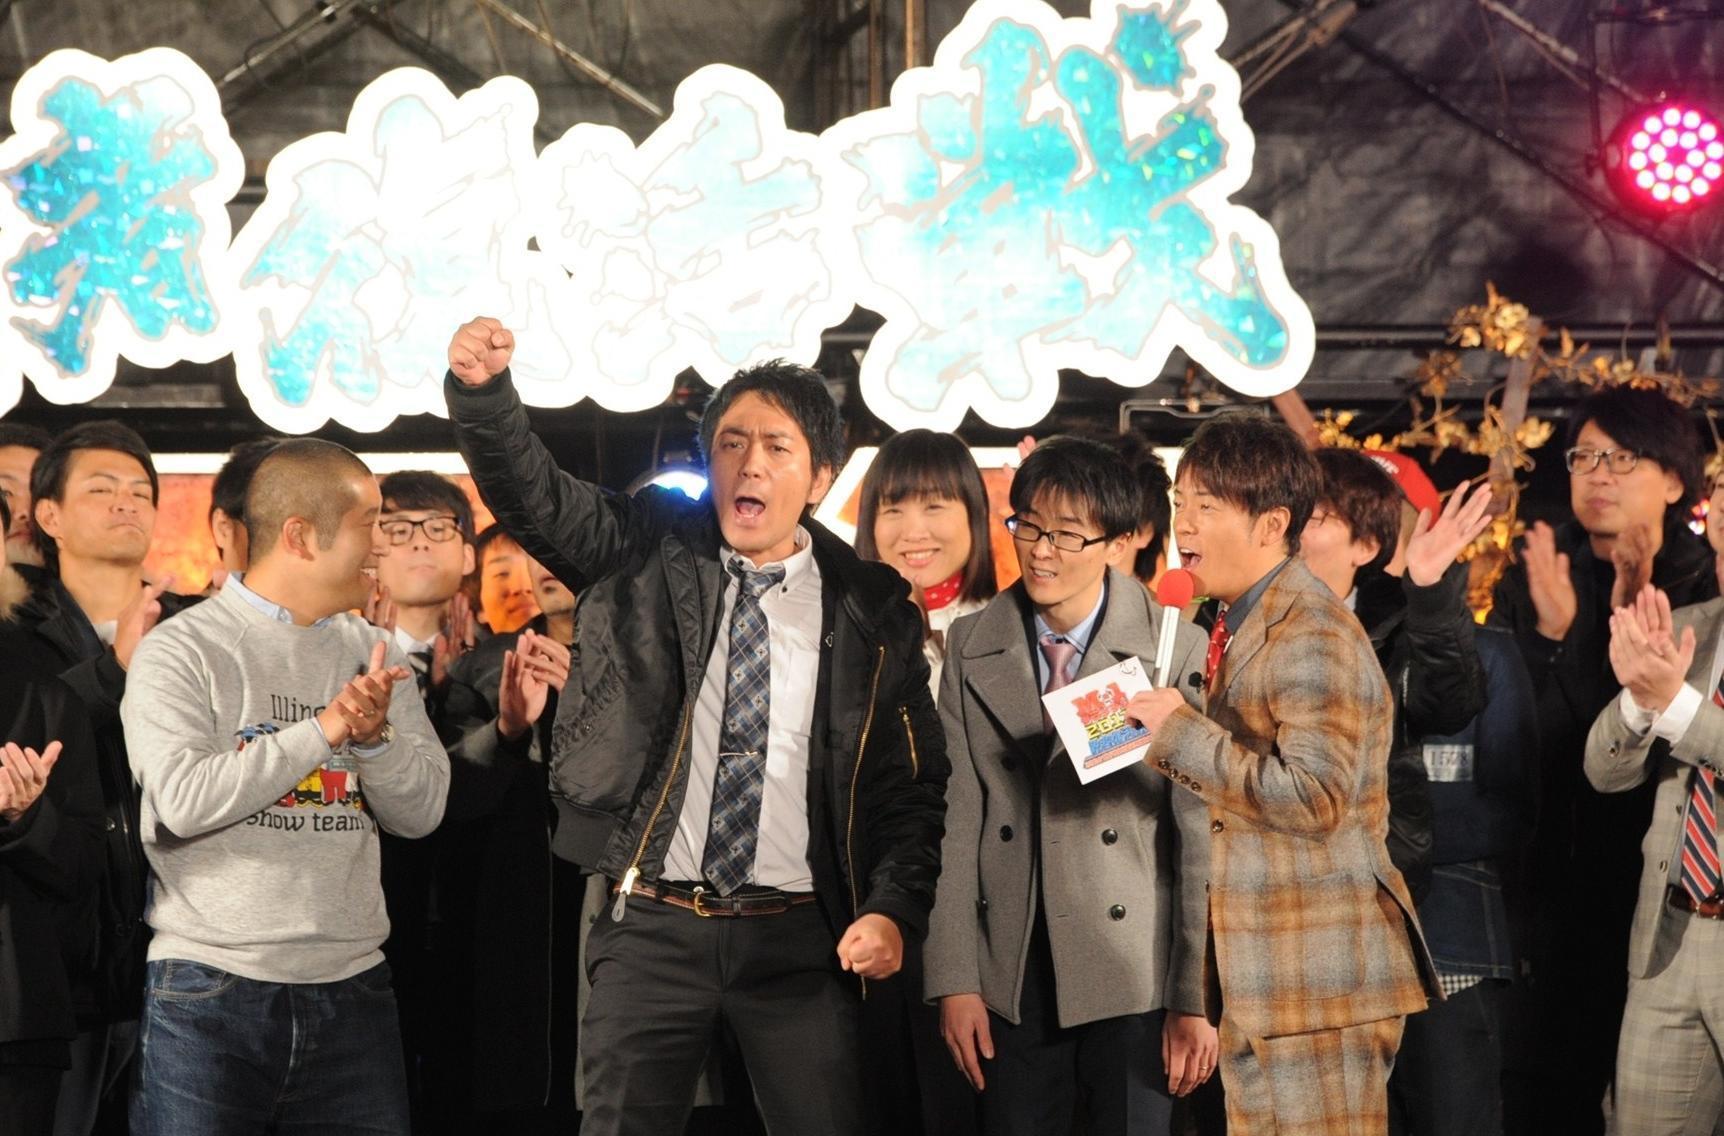 http://news.yoshimoto.co.jp/20171204150908-5479b7502be08c442251ad920190f14b5202d60d.jpg